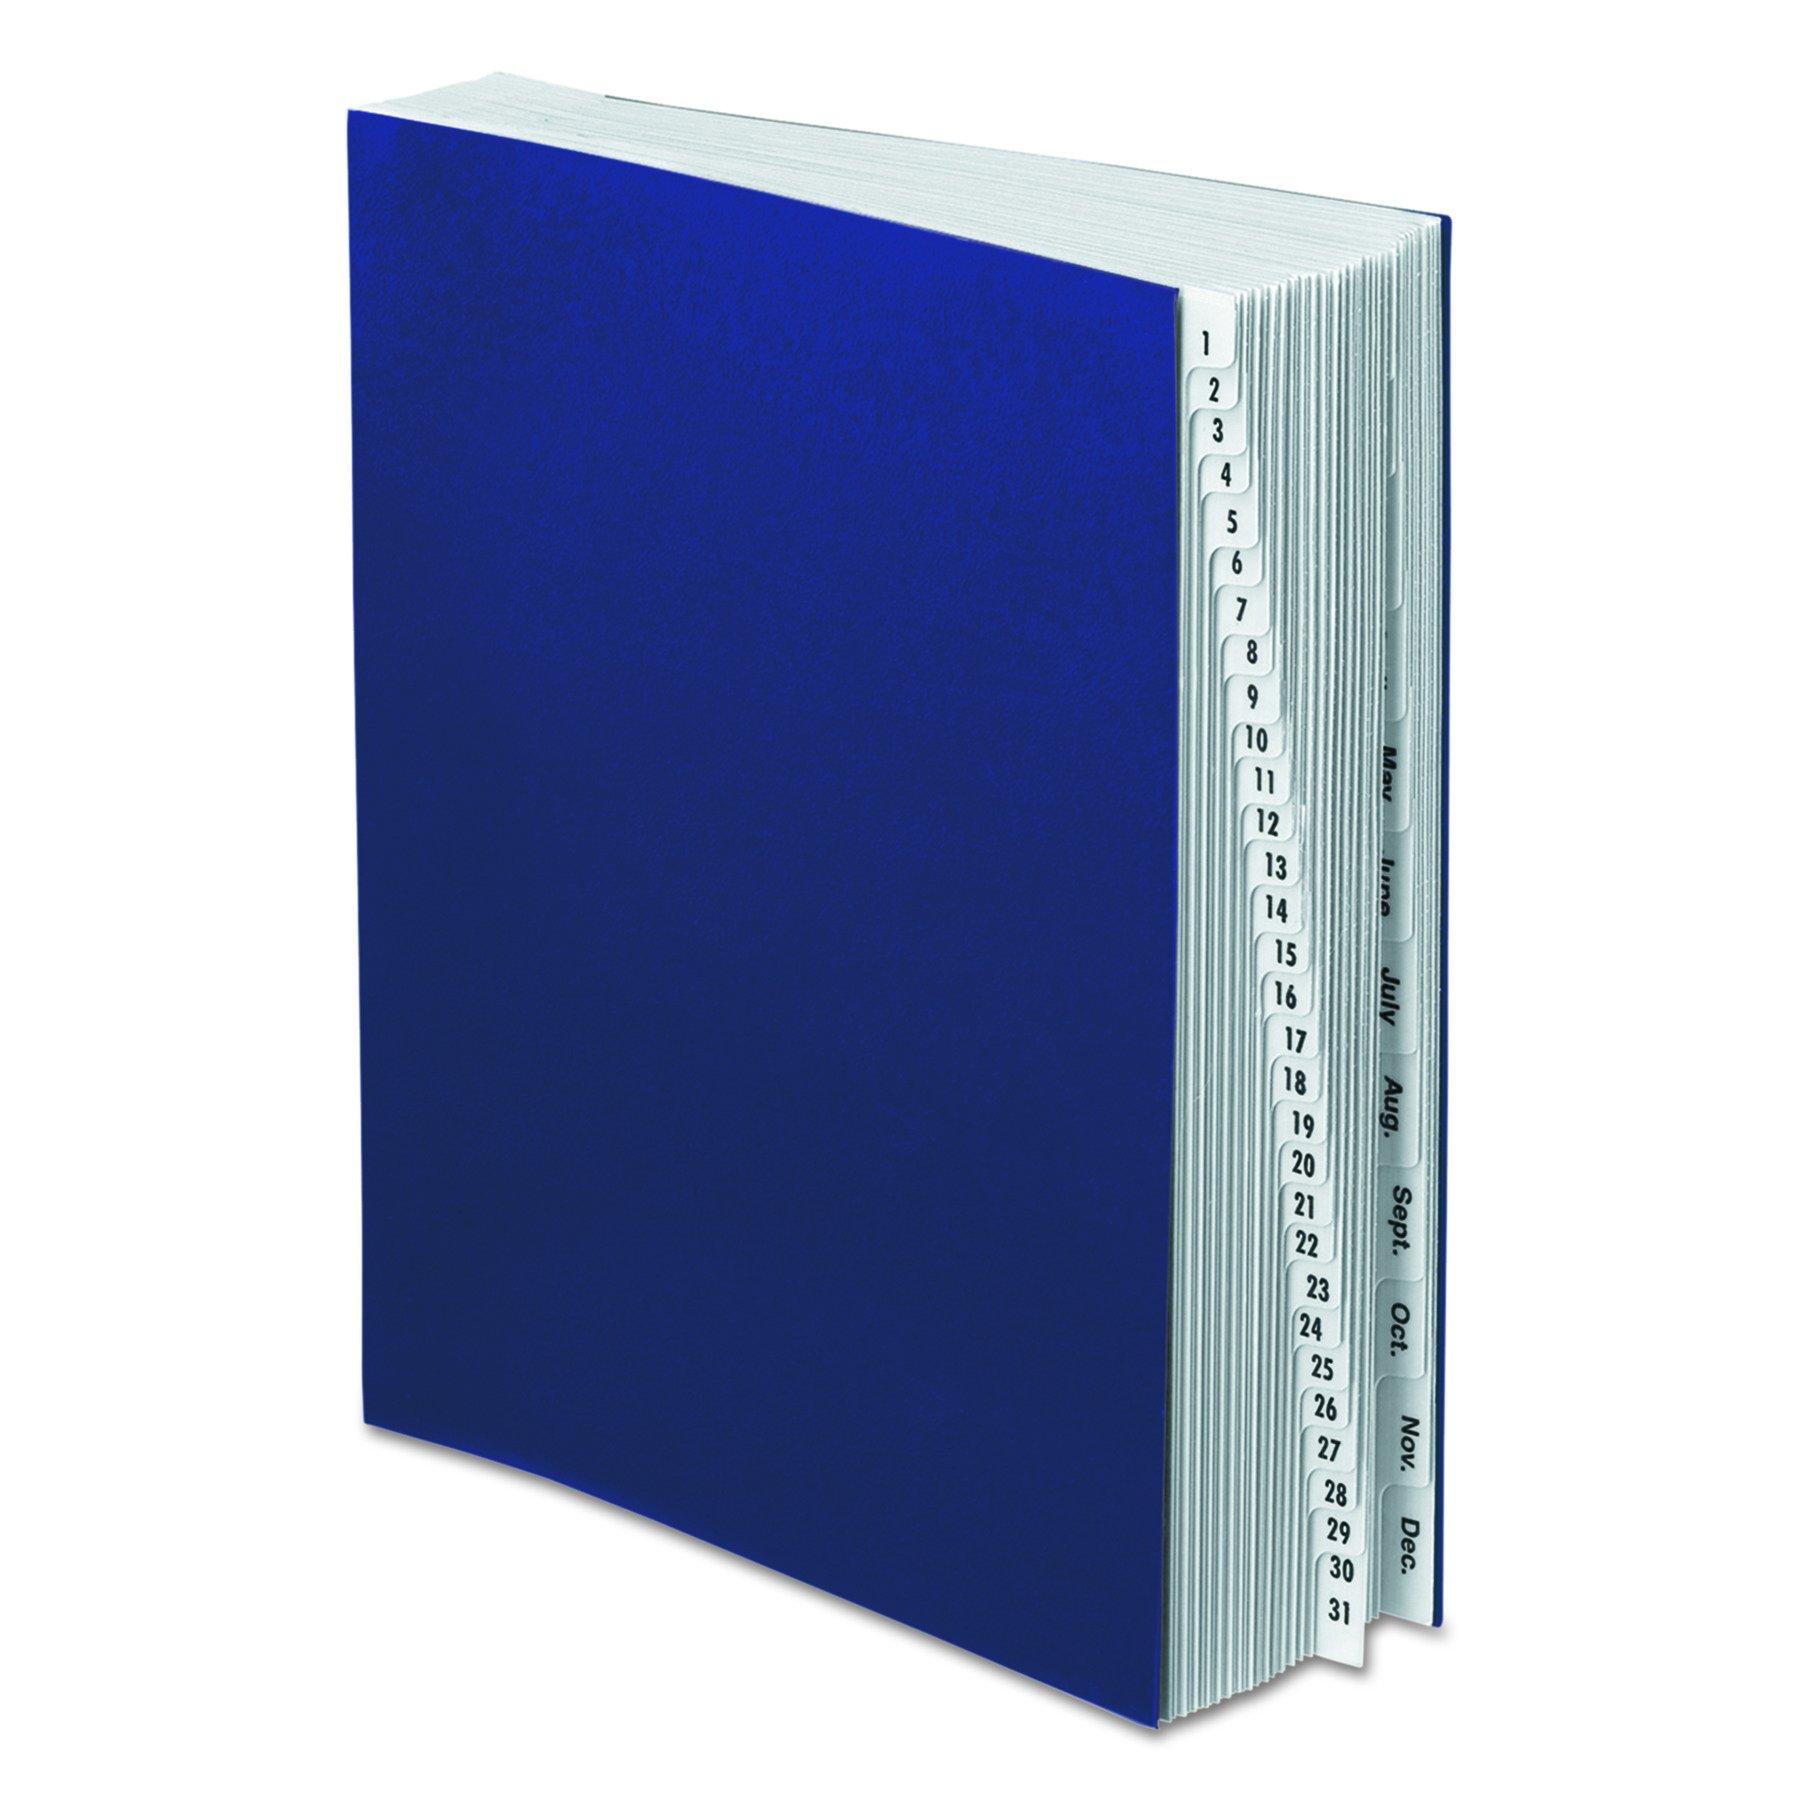 Pendaflex DDF5OX Expanding Desk File, 1-31/Jan-Dec, Letter, Acrylic-Coated Pressboard, Dark Blue